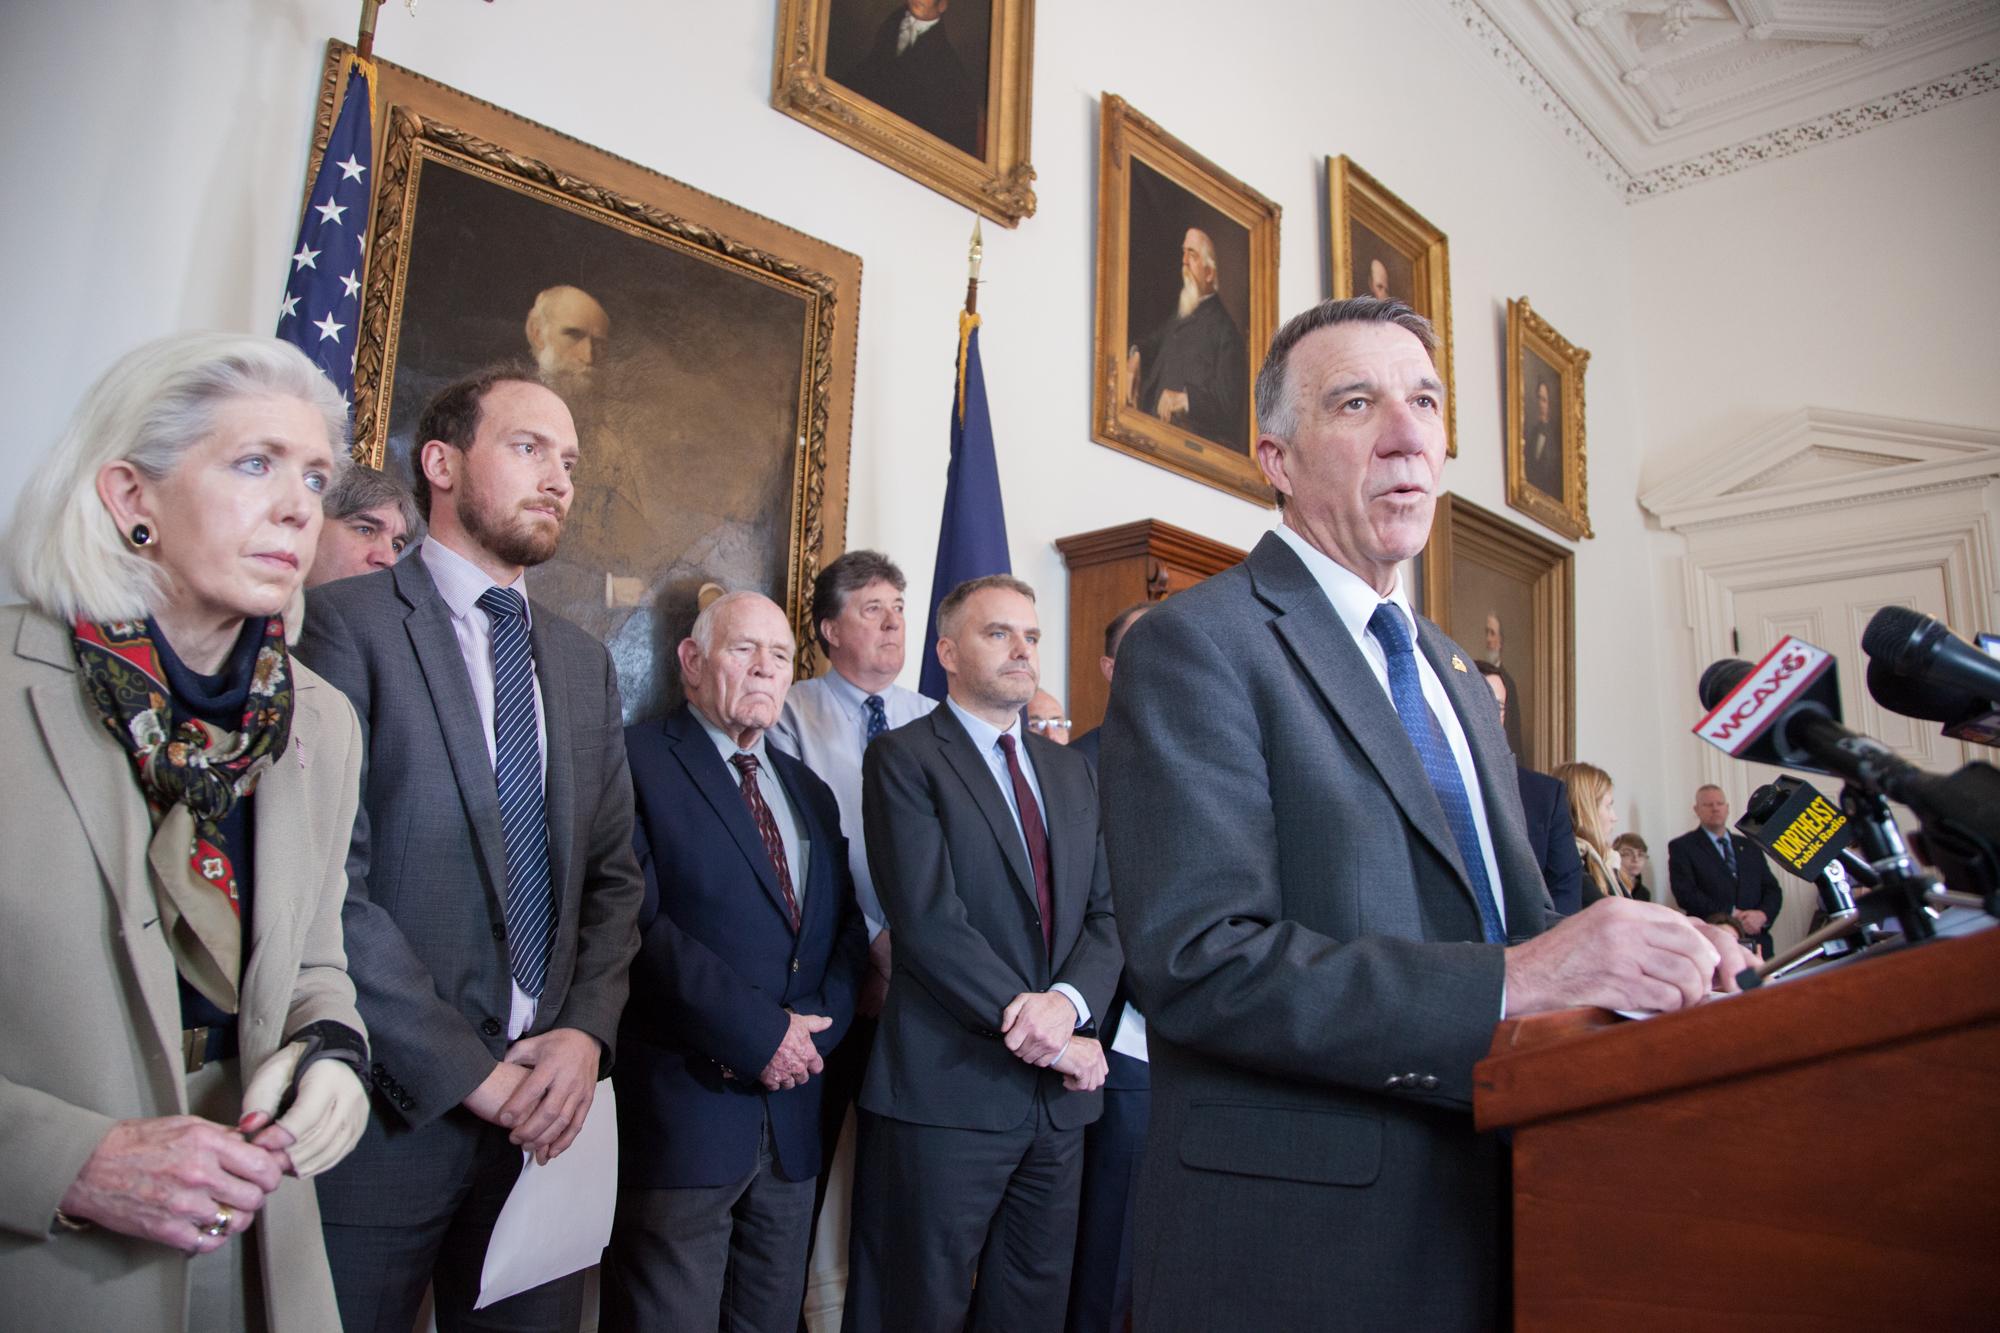 Scott vetoes medical monitoring bill, but sees pro-industry path forward